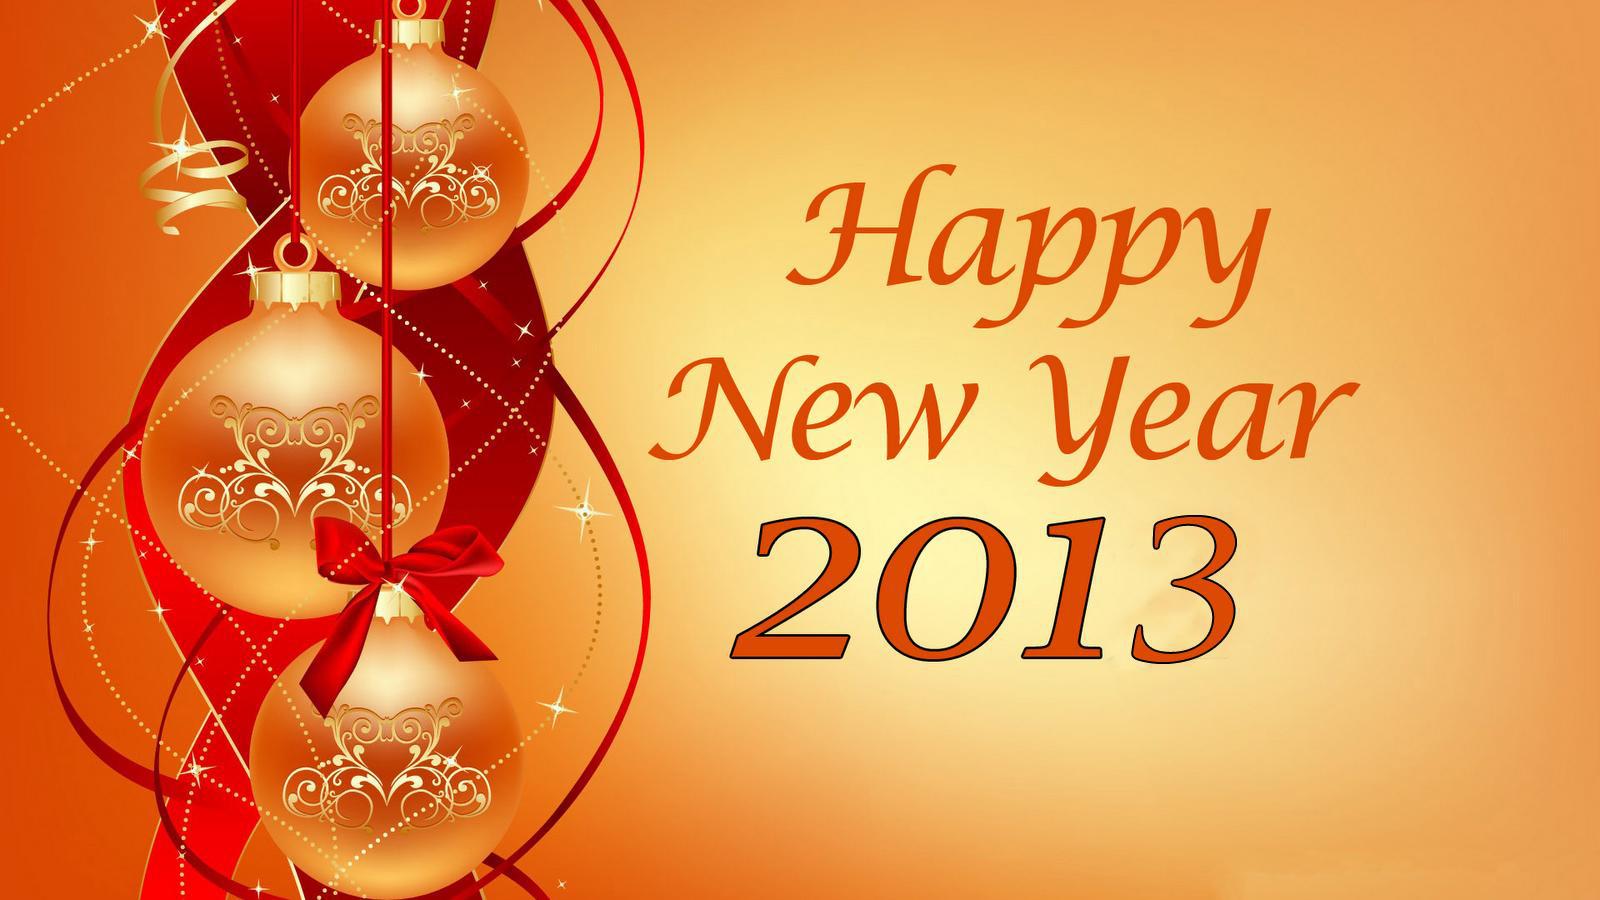 http://1.bp.blogspot.com/-DcTBy8t_4B8/UOLEudPLefI/AAAAAAAADiw/AIHXve4t45g/s1600/HD-new-year-free-wallpaper-2013.jpg